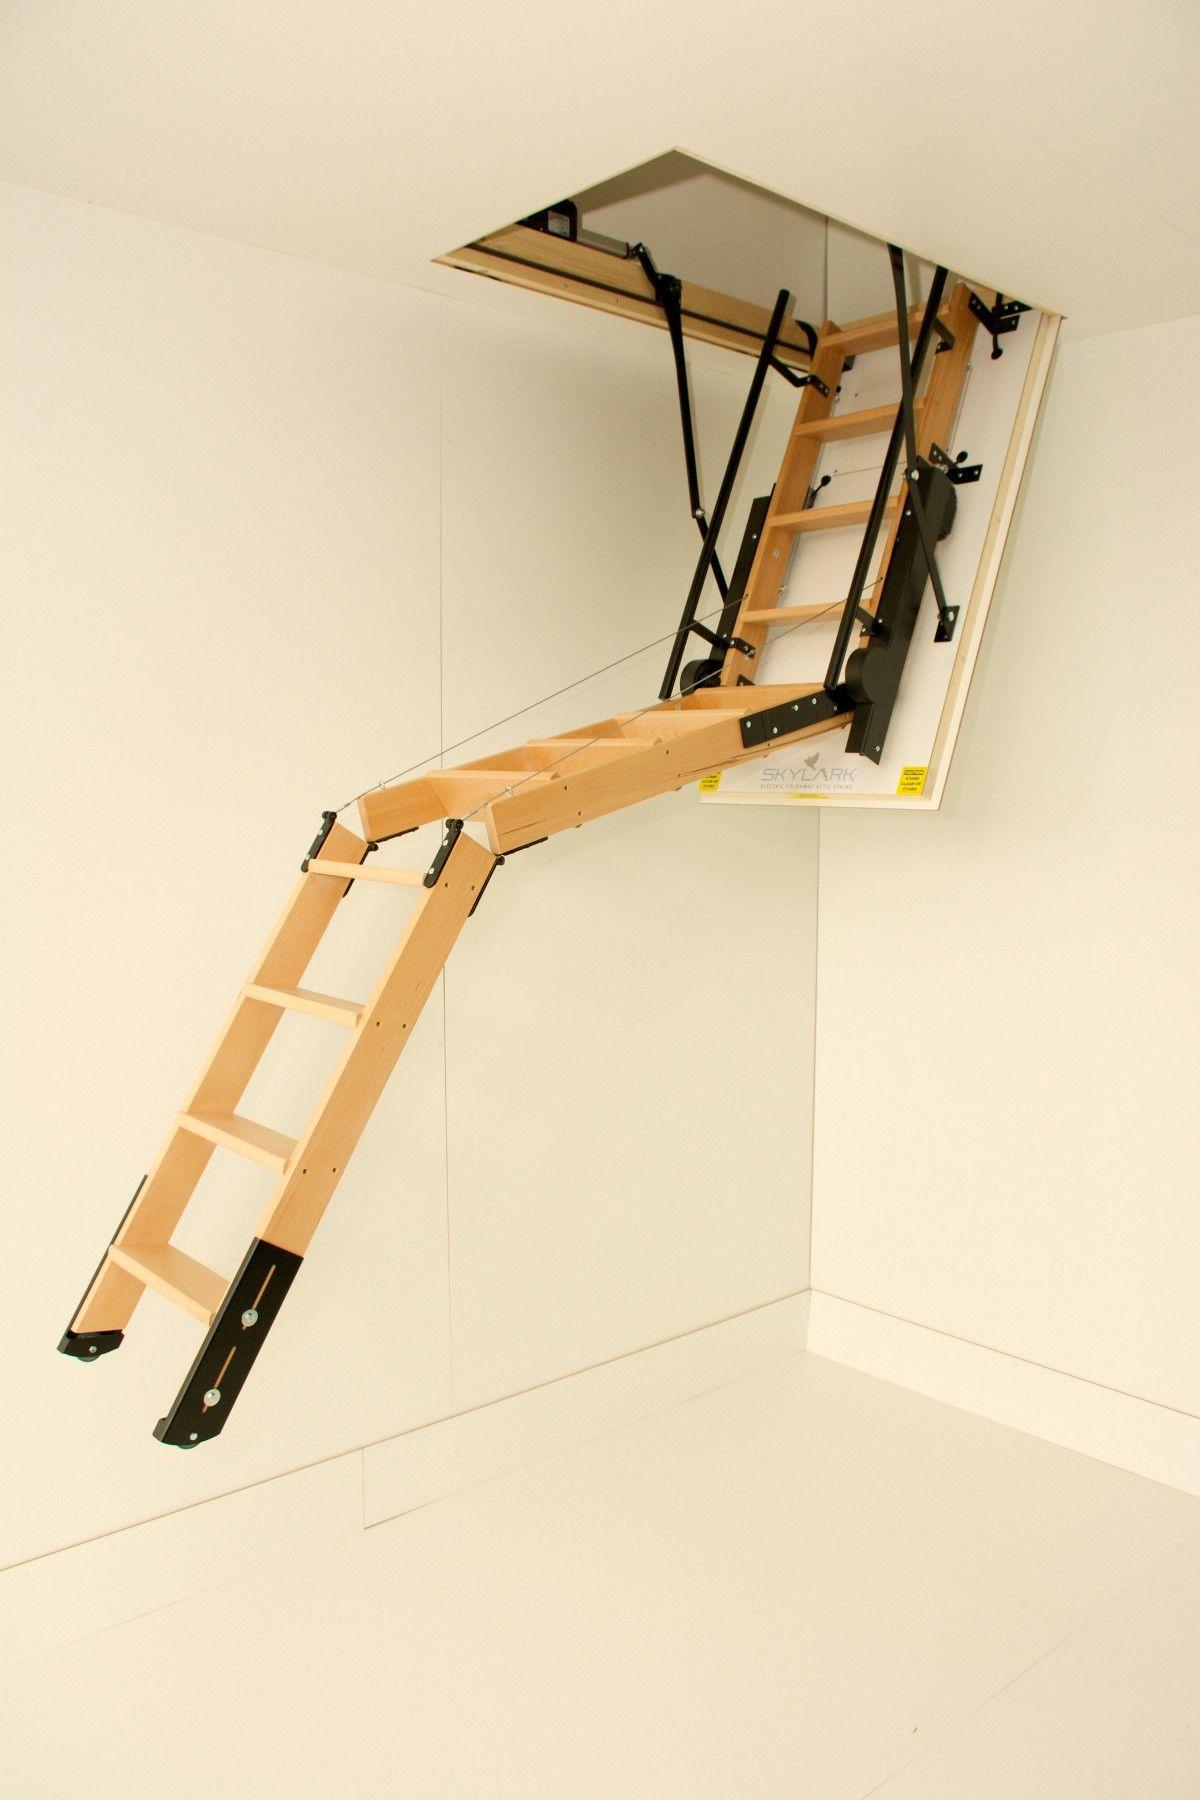 Best Skylark 3 Section Electric Timber Folding Loft Ladder 400 x 300